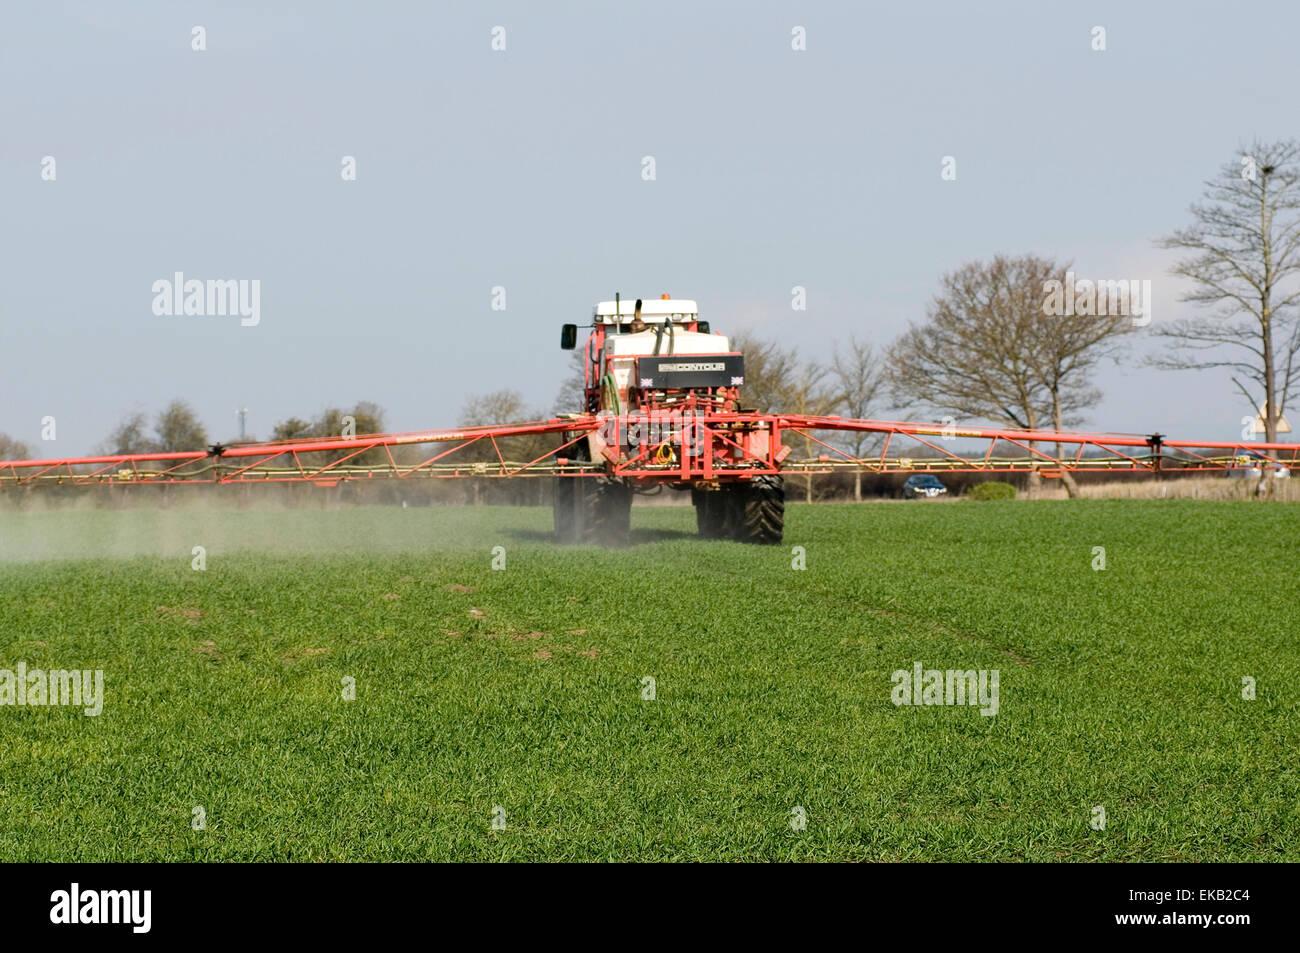 tractor spraying crops crop spraying tractors field fields farm farming farms agriculture farmer farmers pesticide - Stock Image